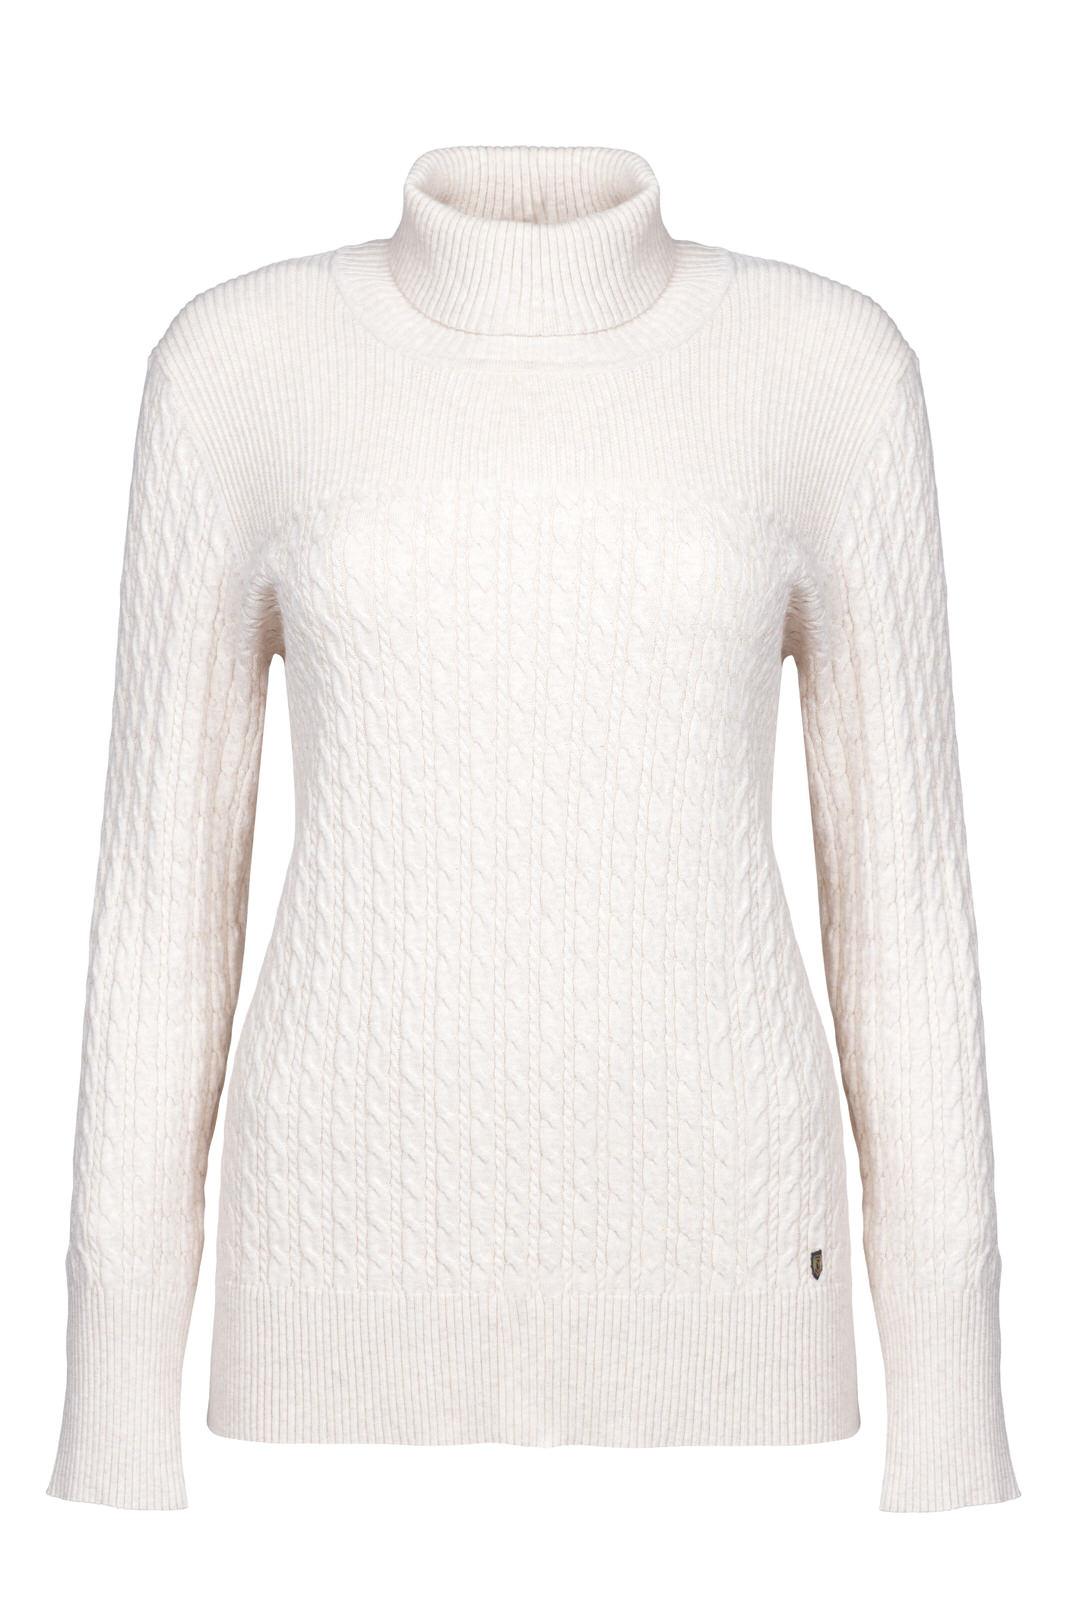 Dubarry_ Boylan Polo Neck Sweater - Oyster_Image_2